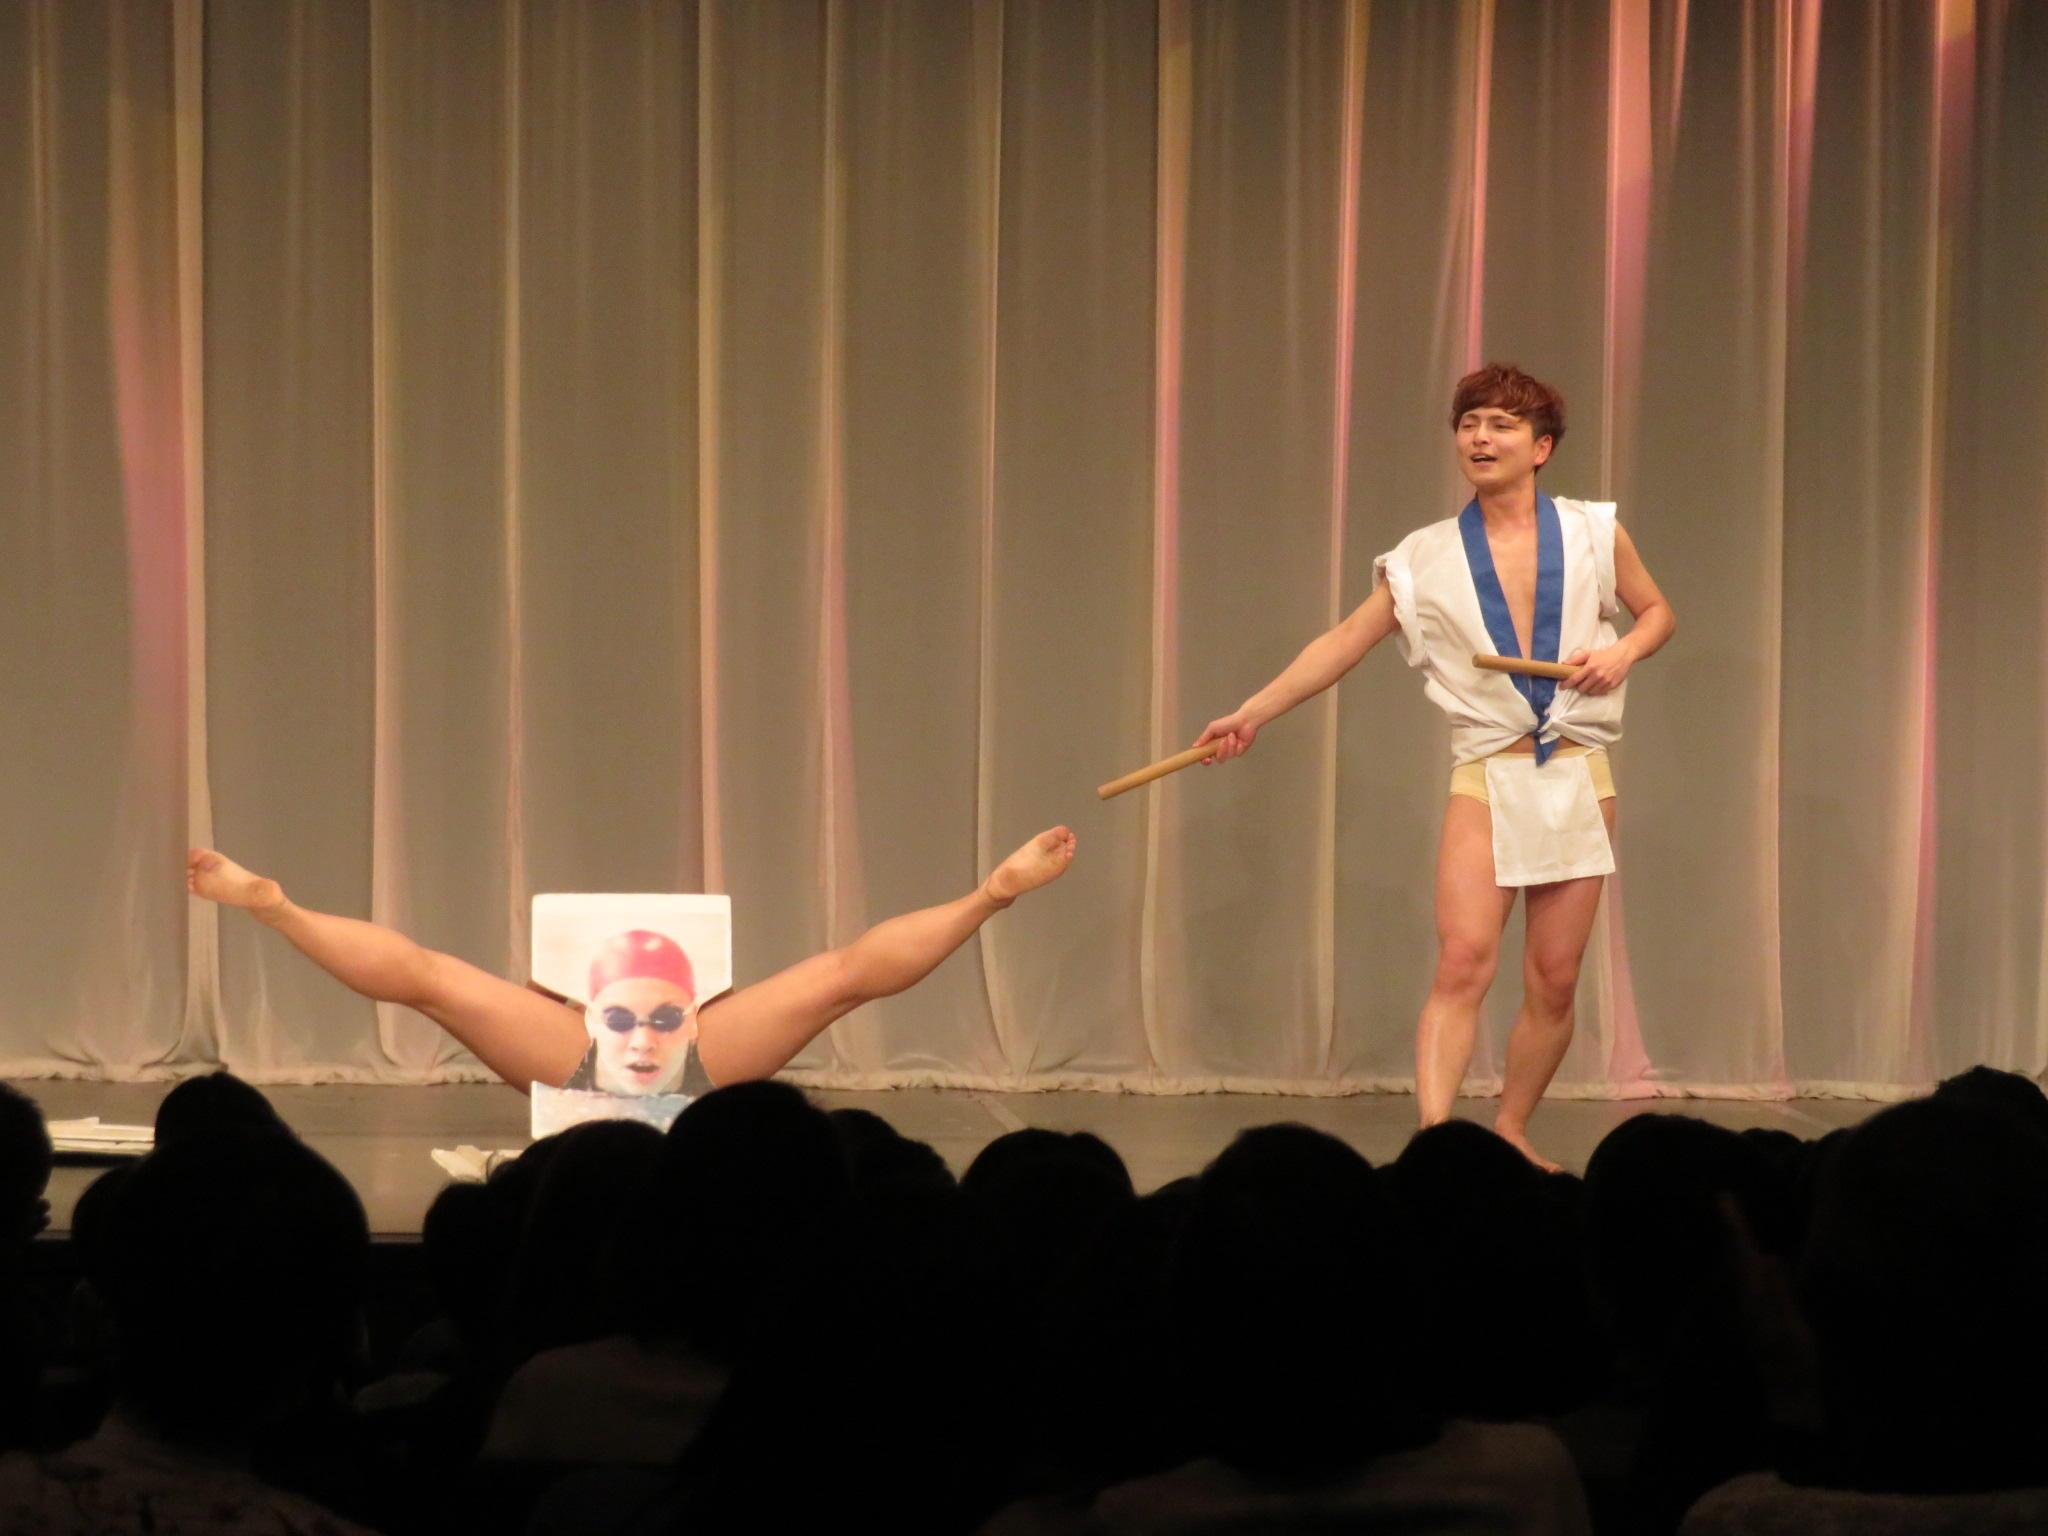 http://news.yoshimoto.co.jp/20180110190622-3fbf1700774e88545c7d7d694961ab6a9a29f473.jpg